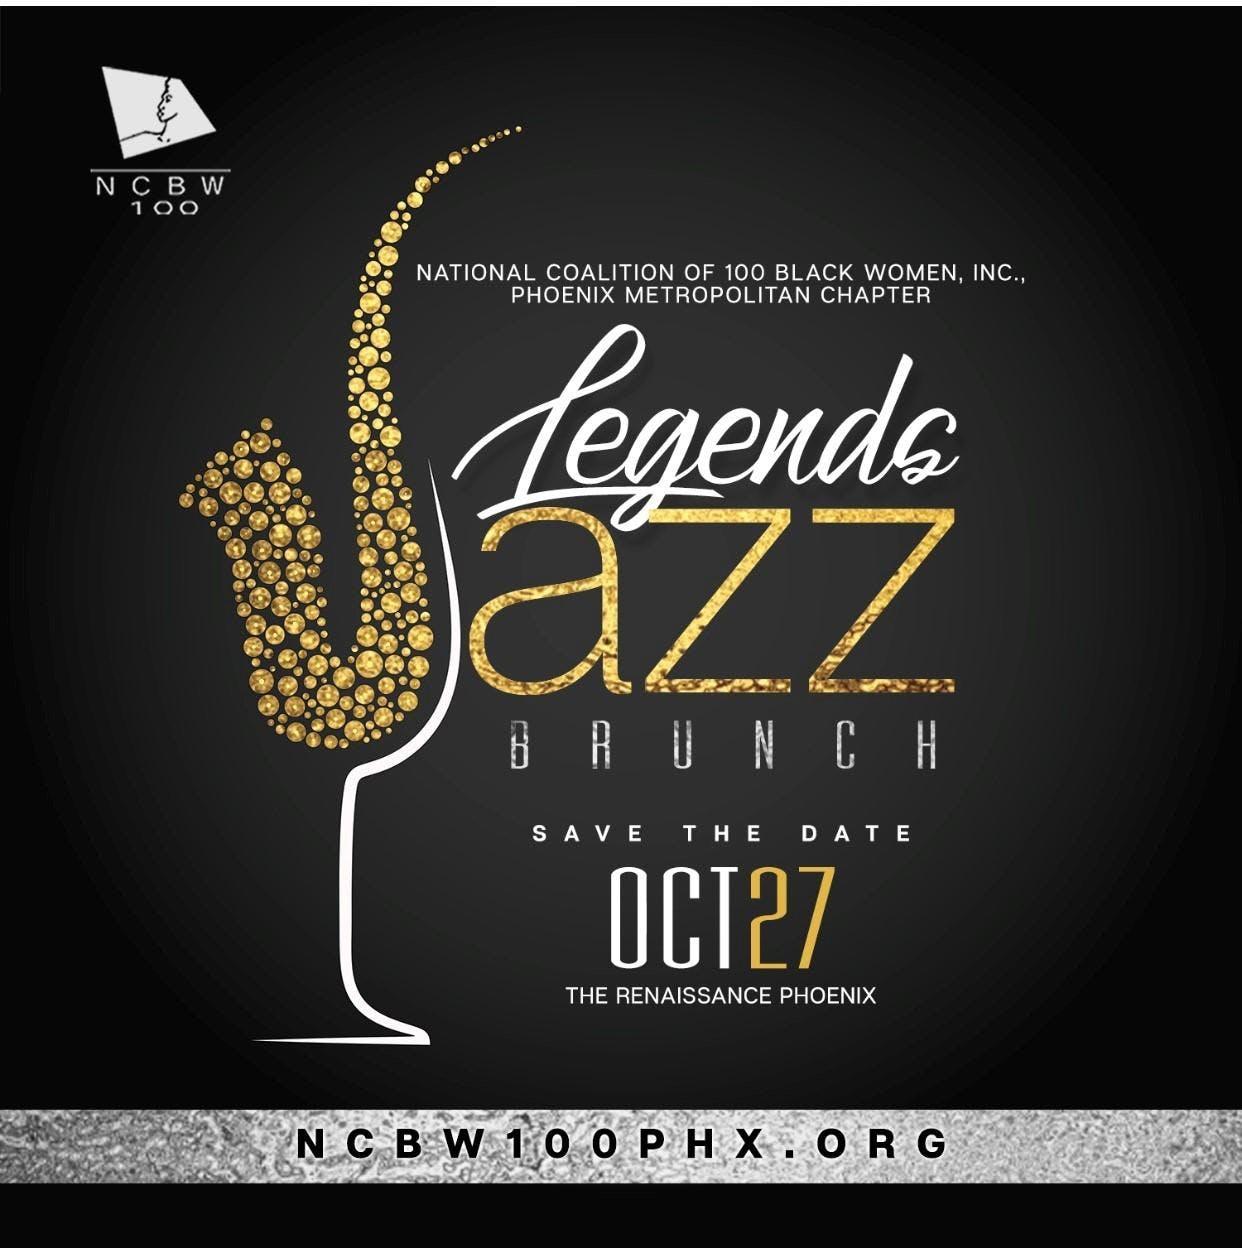 3rd Annual NCBW Legends Jazz Brunch